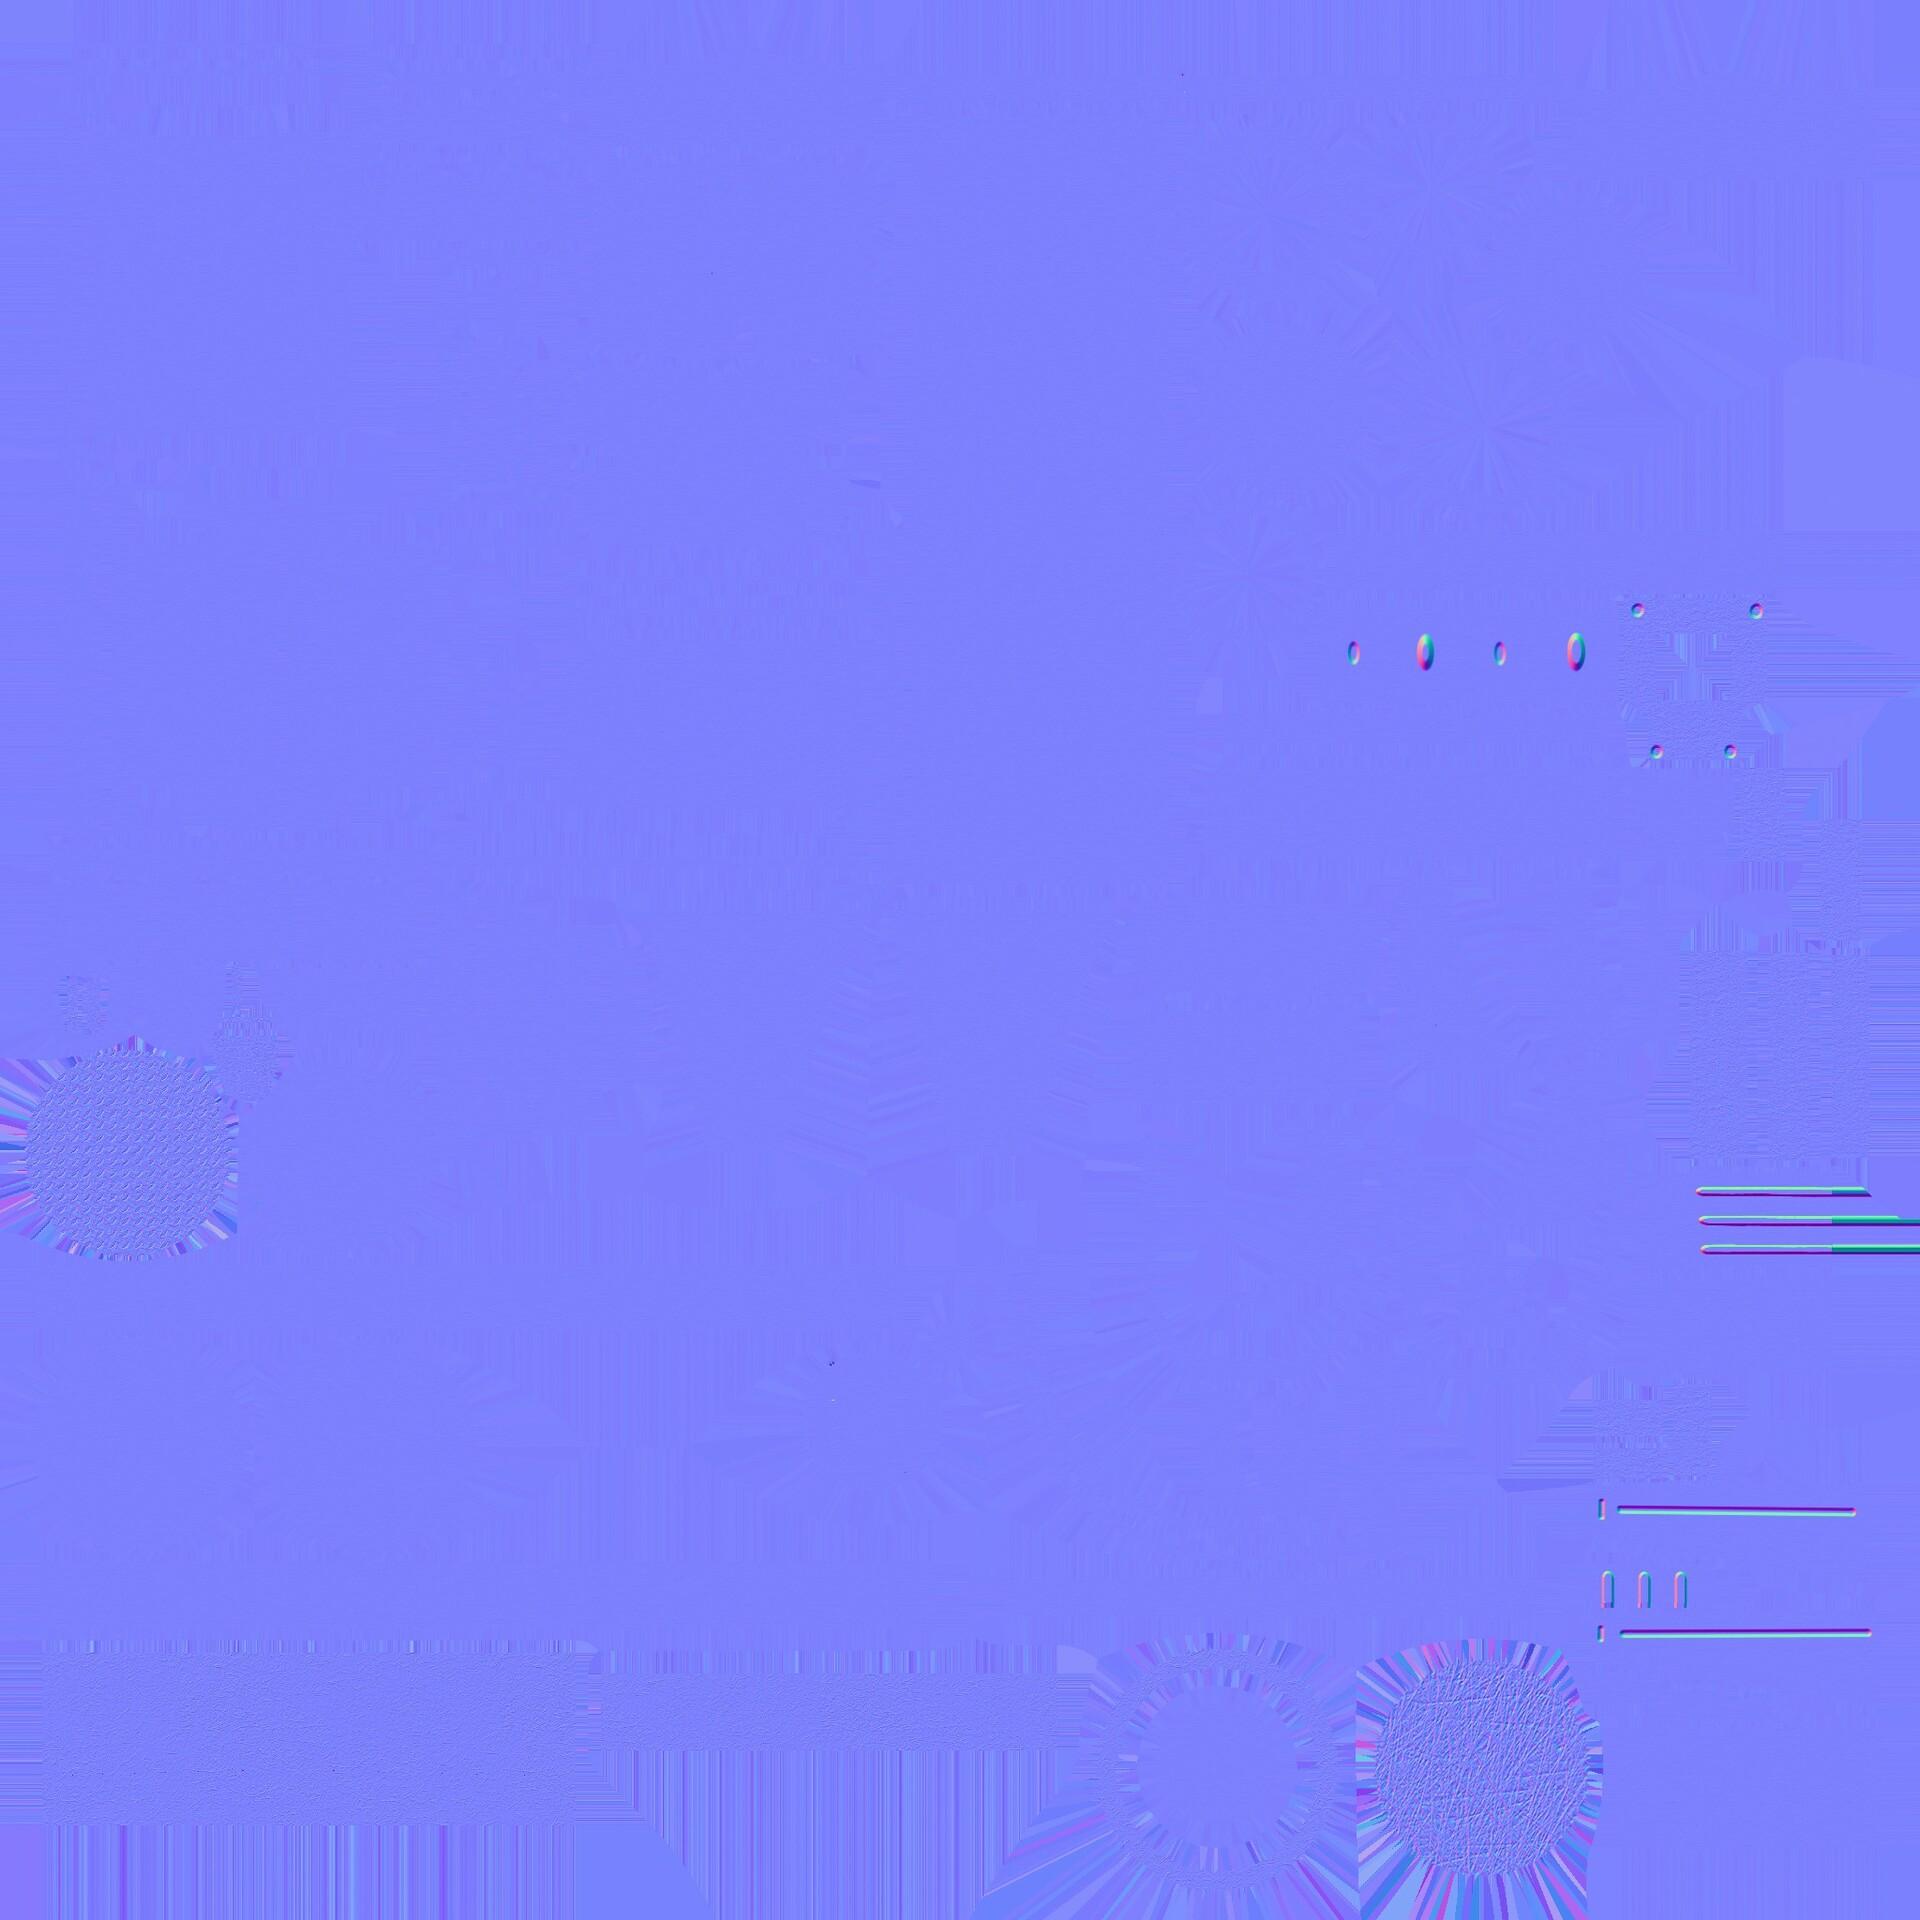 James skinner tower viewer single v2 defaultmaterial normal